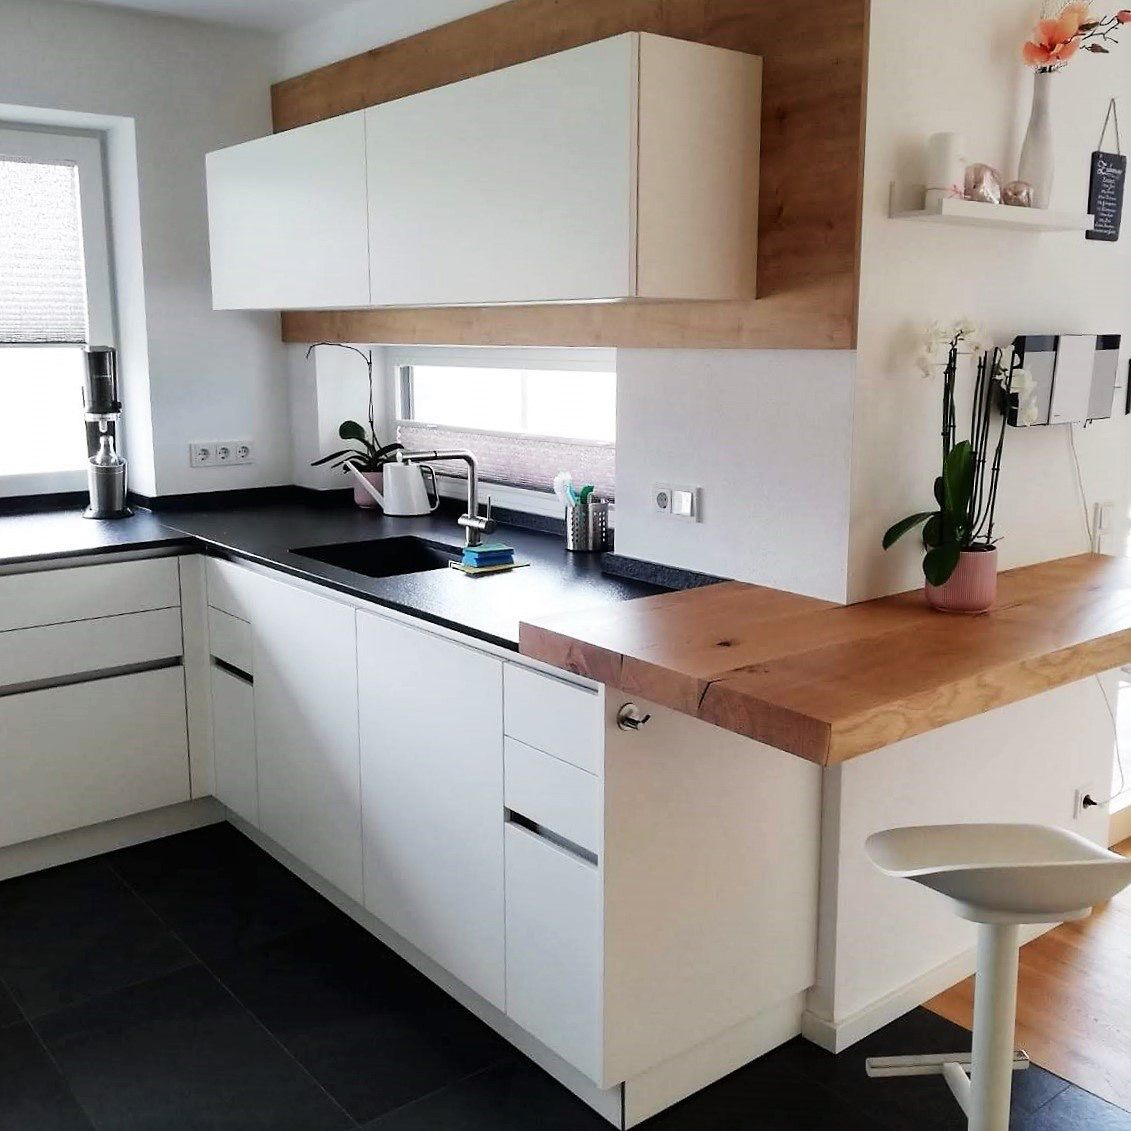 Decor Pinterest Küche Modern   Spülbecken Aufbewahrung Küchenutensilien Ikea